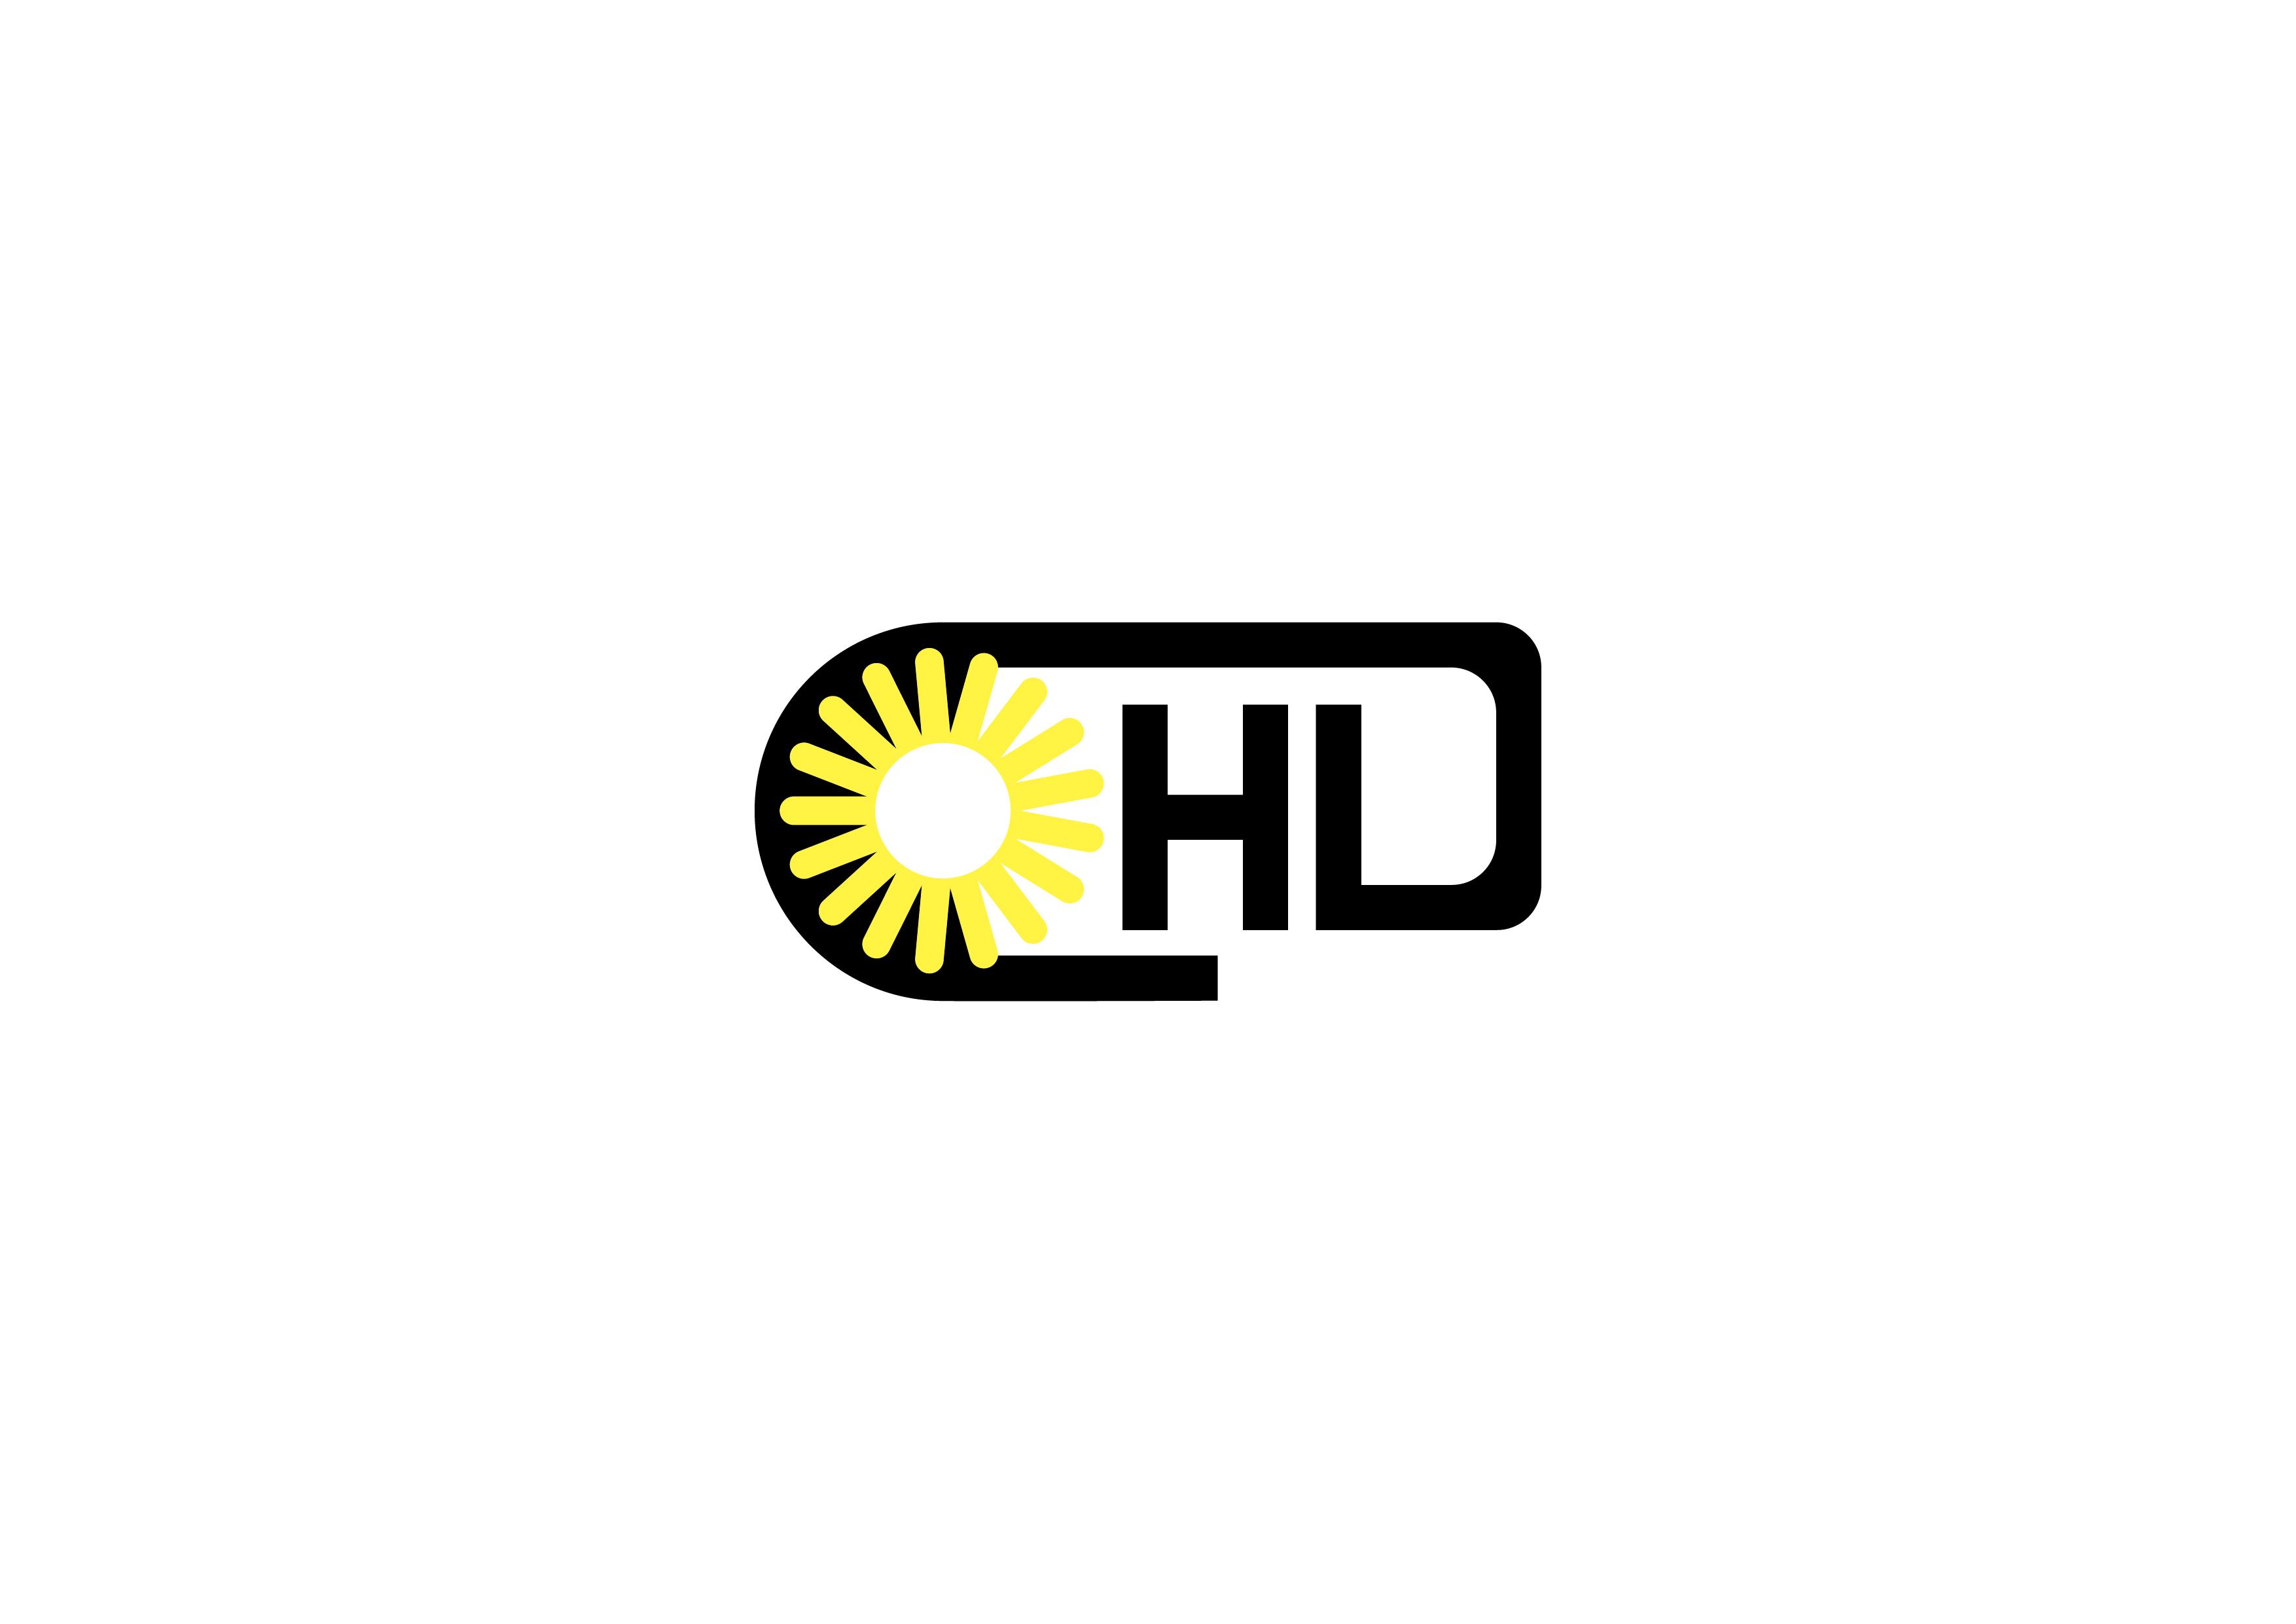 разработка логотипа для производителя фар фото f_2995f5a344d925fe.jpg